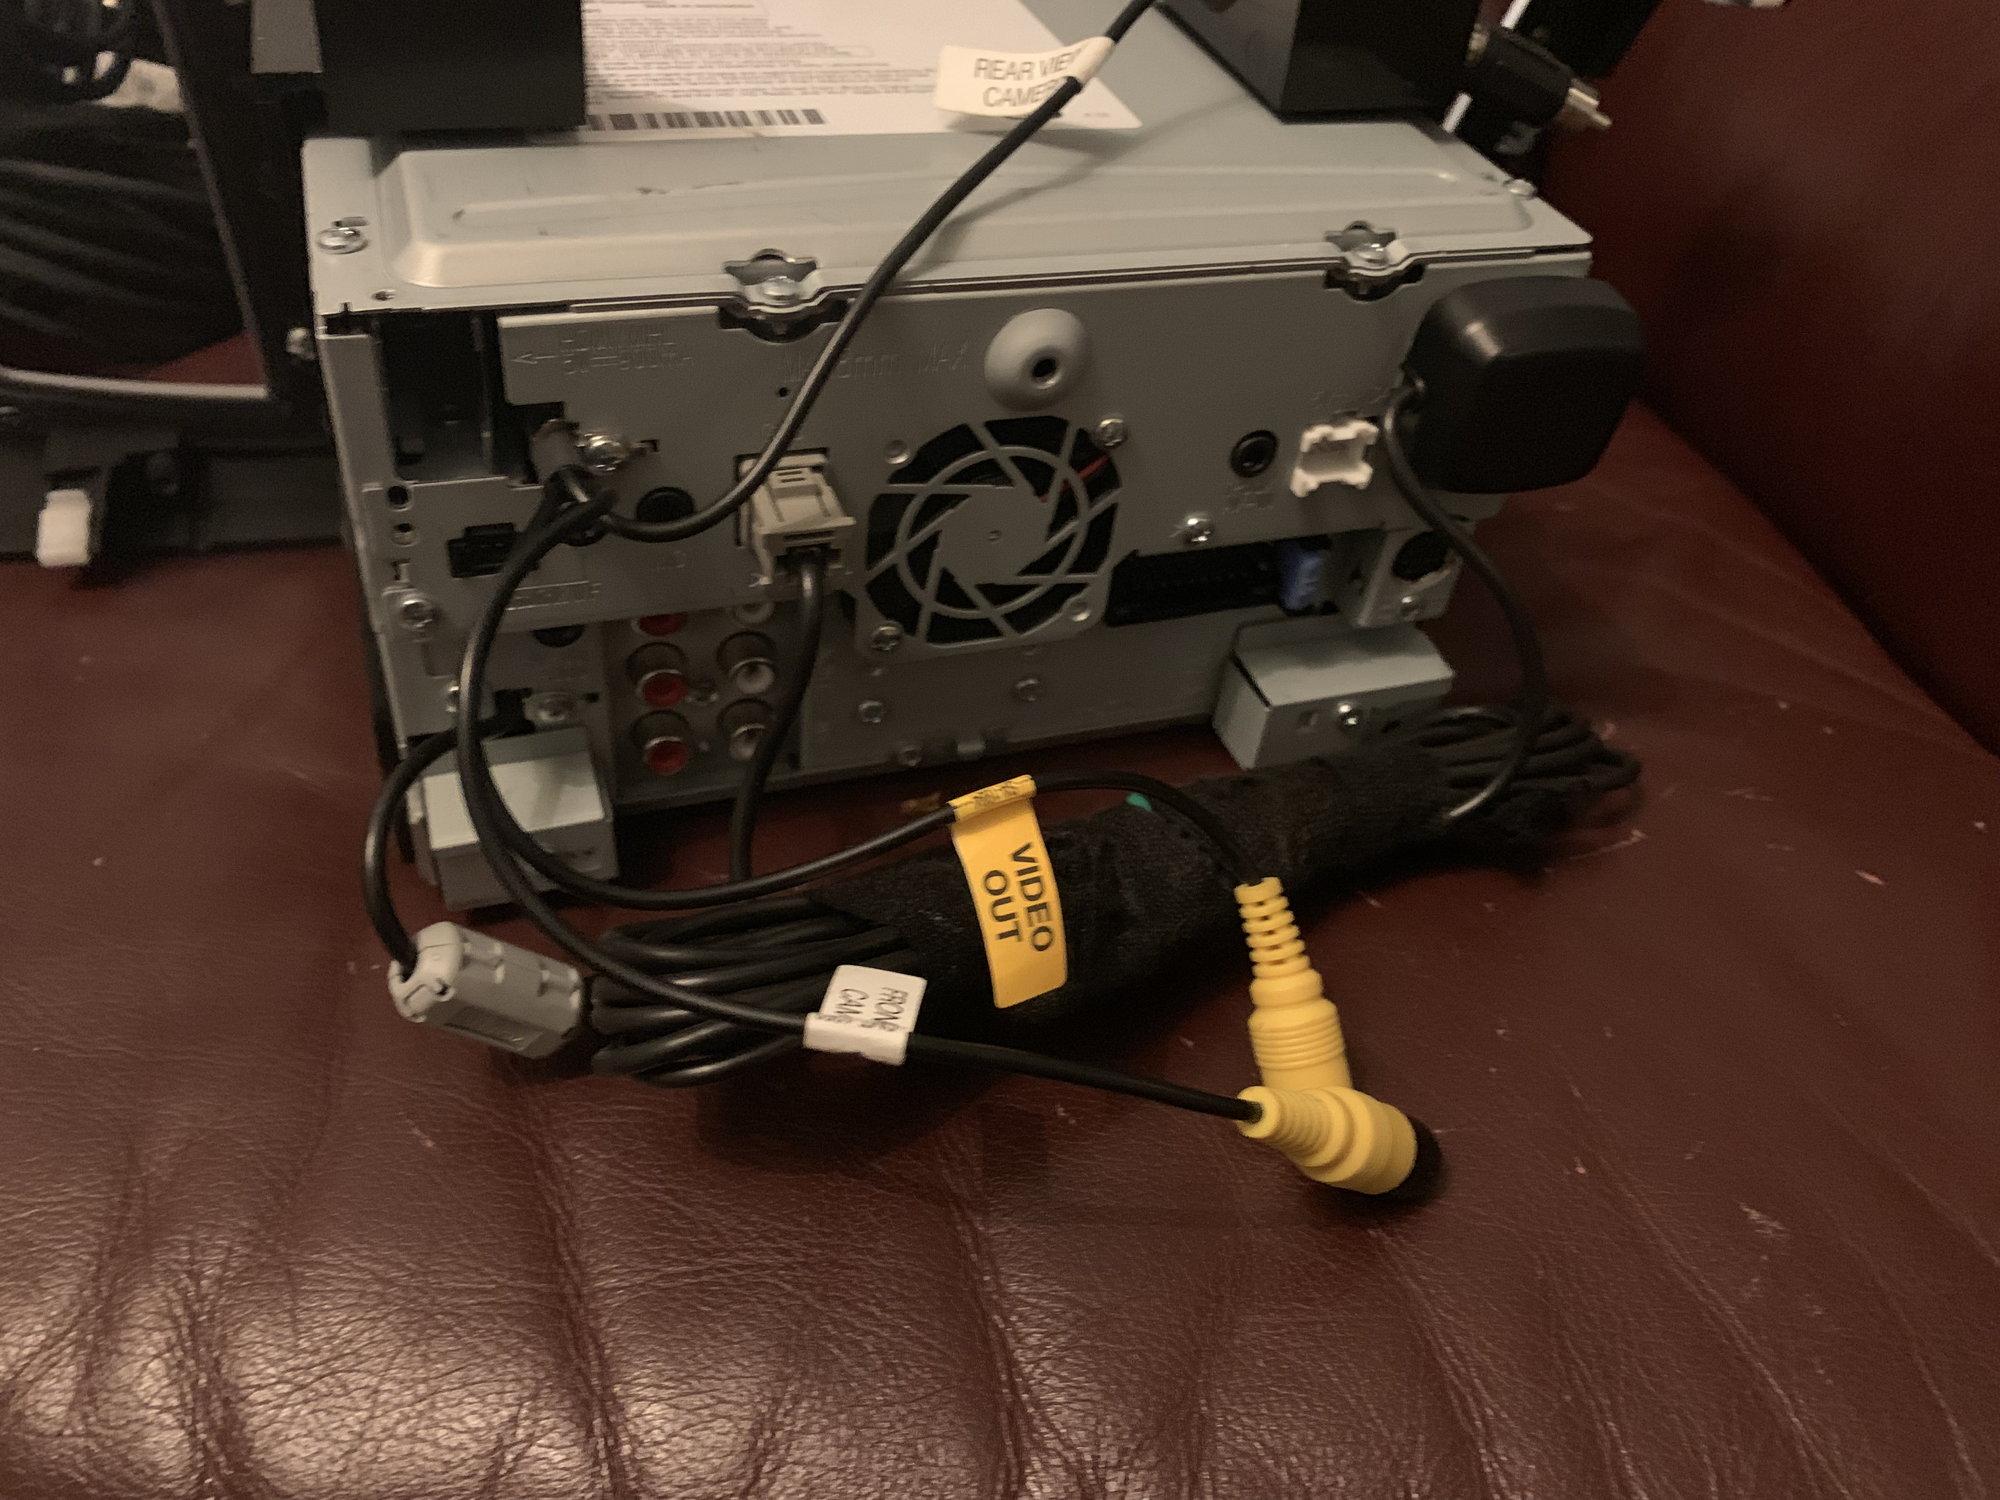 Gen 9 dbl din Kwood w/dash it/wire harnesses - Honda Accord ... Kenwood Ddx S Wiring Harness on kenwood ddx6019, kenwood power supply, kenwood instruction manual, kenwood wiring-diagram, kenwood remote control,